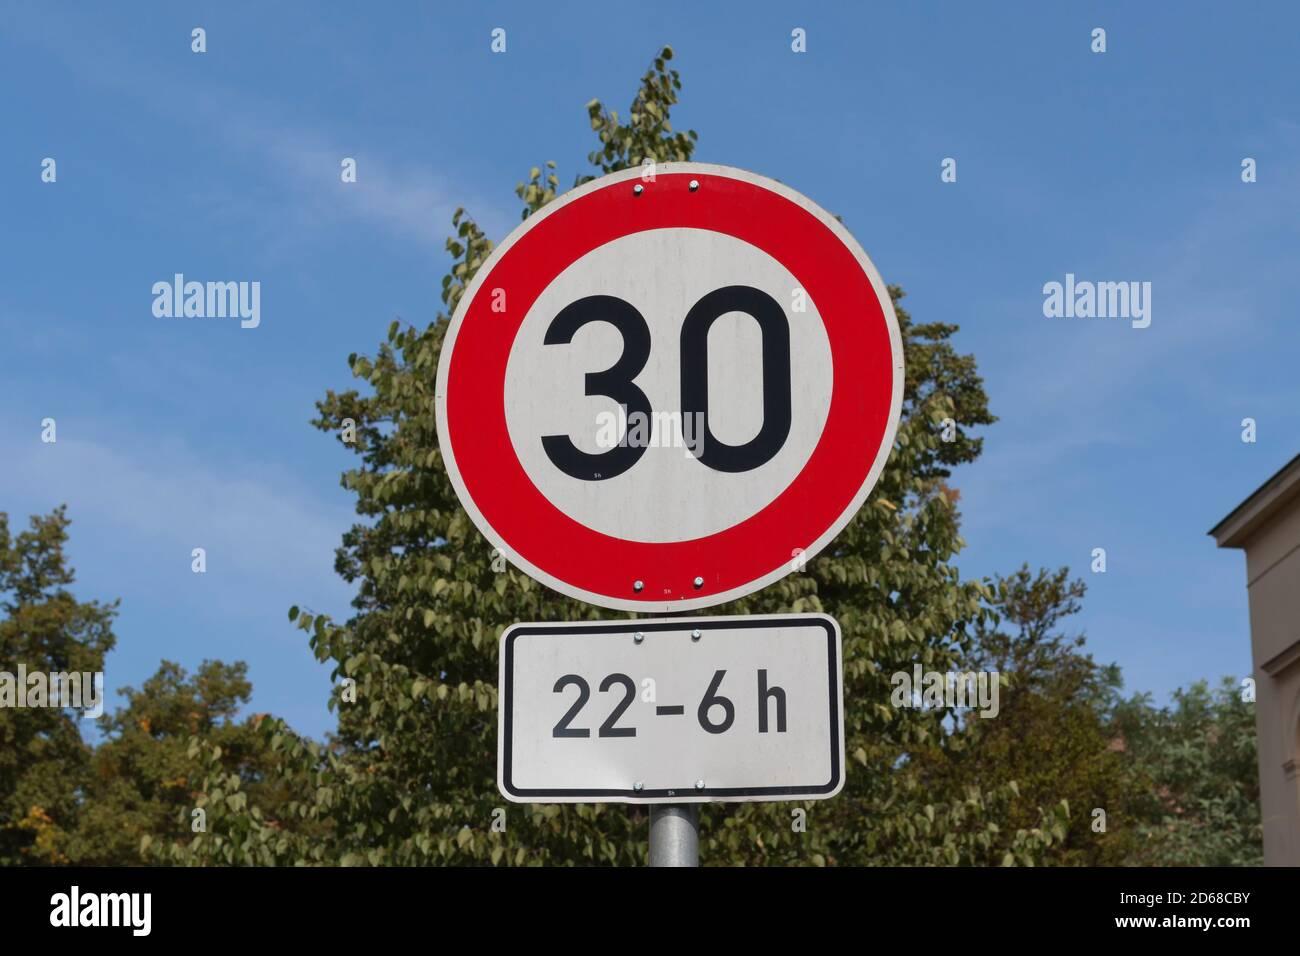 Speed 30, street sign in Berlin Stock Photo